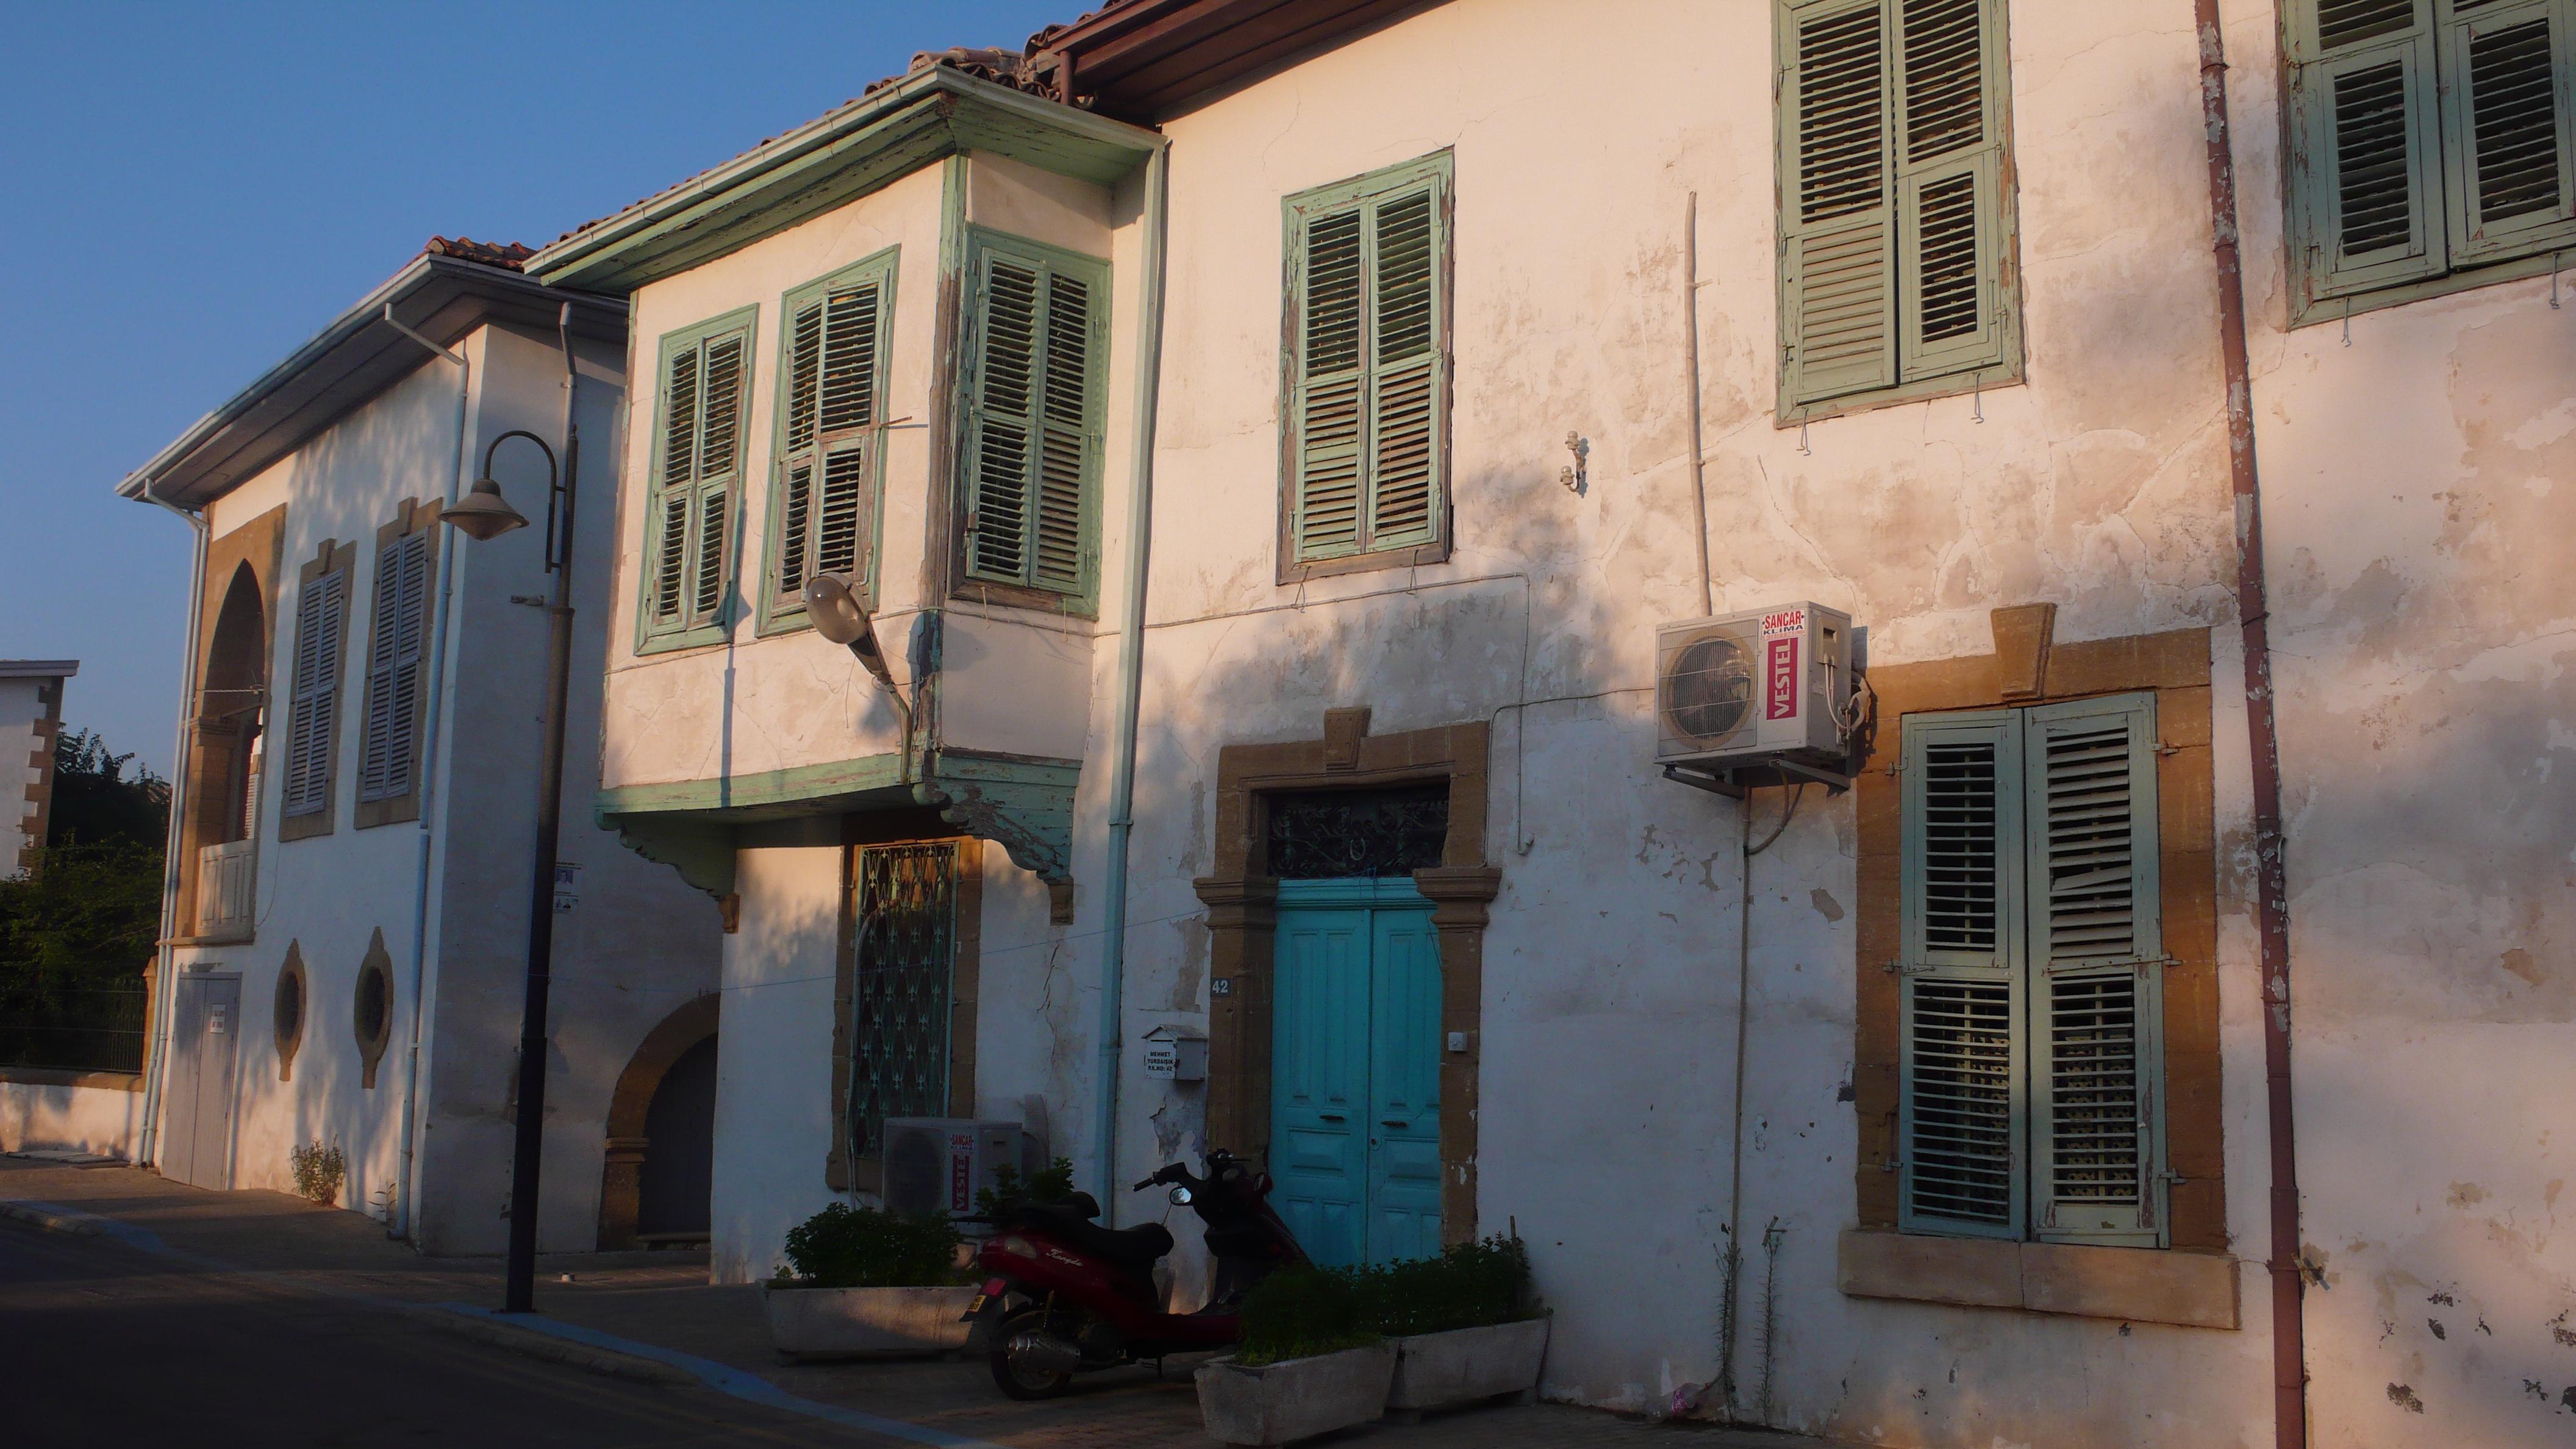 File:ottoman Houses in Nicosia